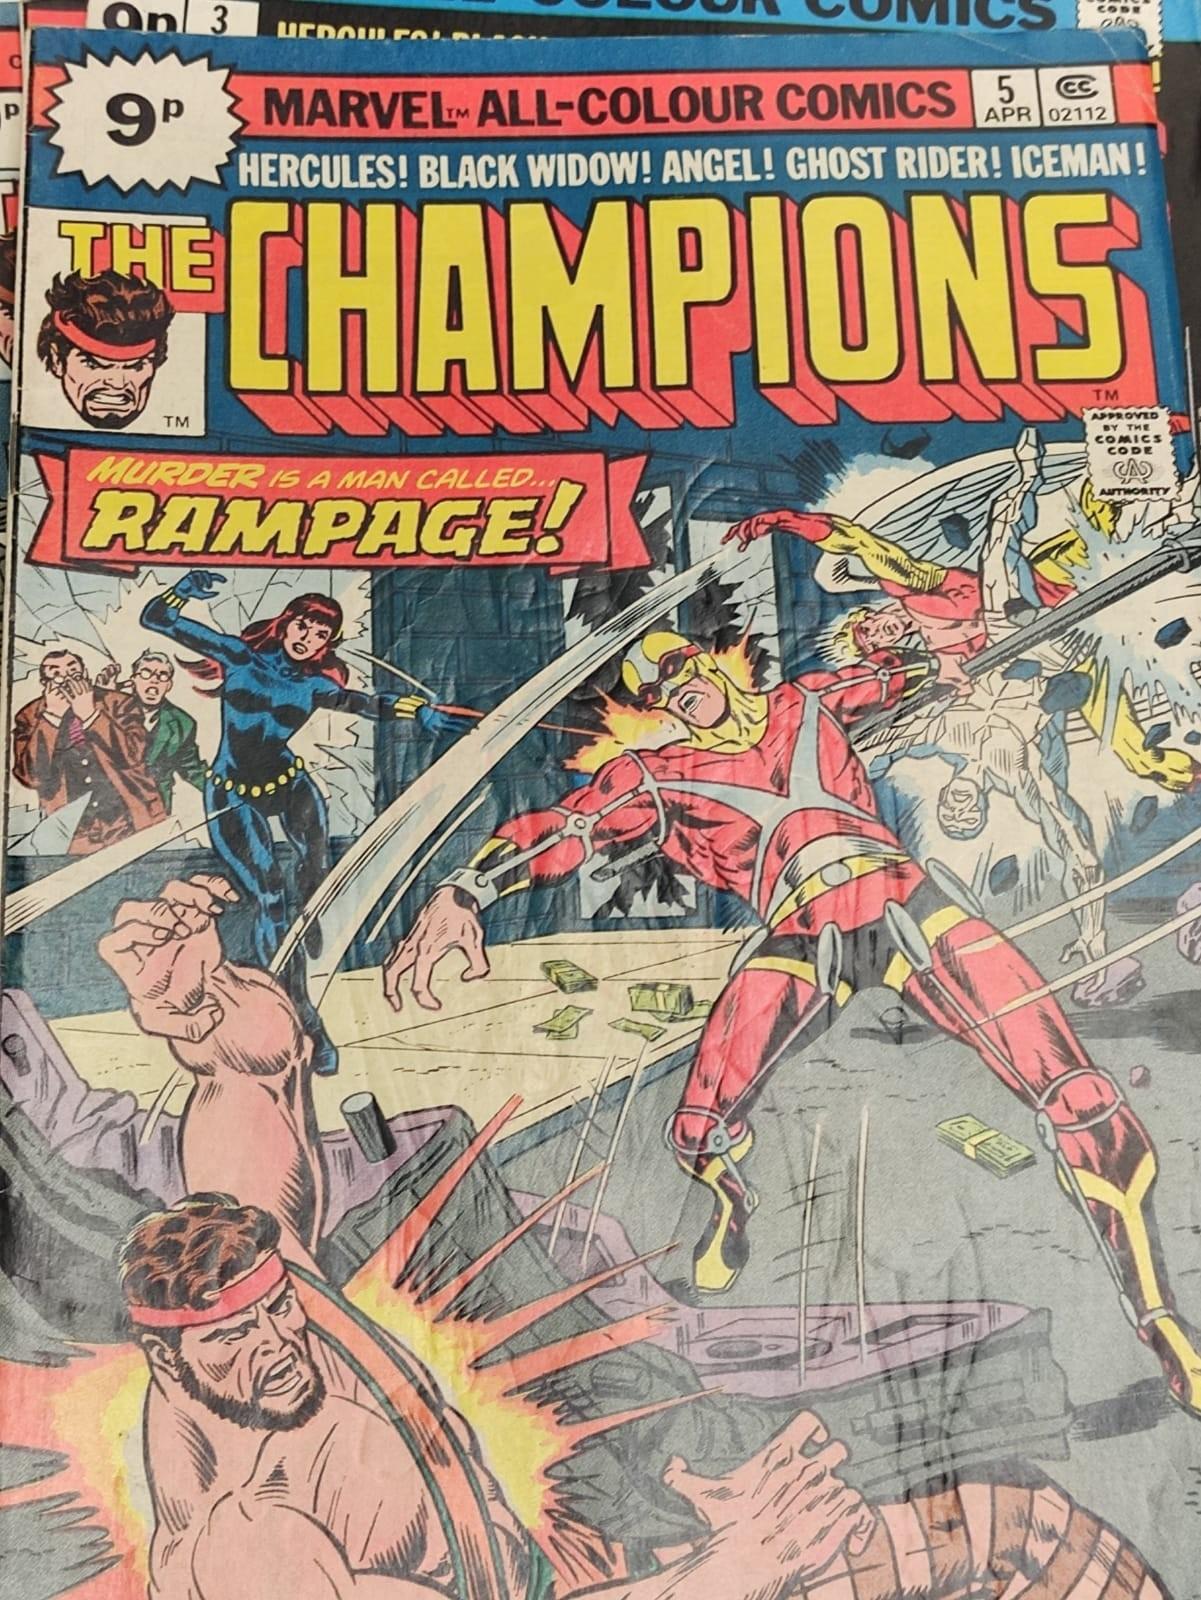 9 Copies of Vintage Marvel 'The Champion' Comics. - Image 3 of 14